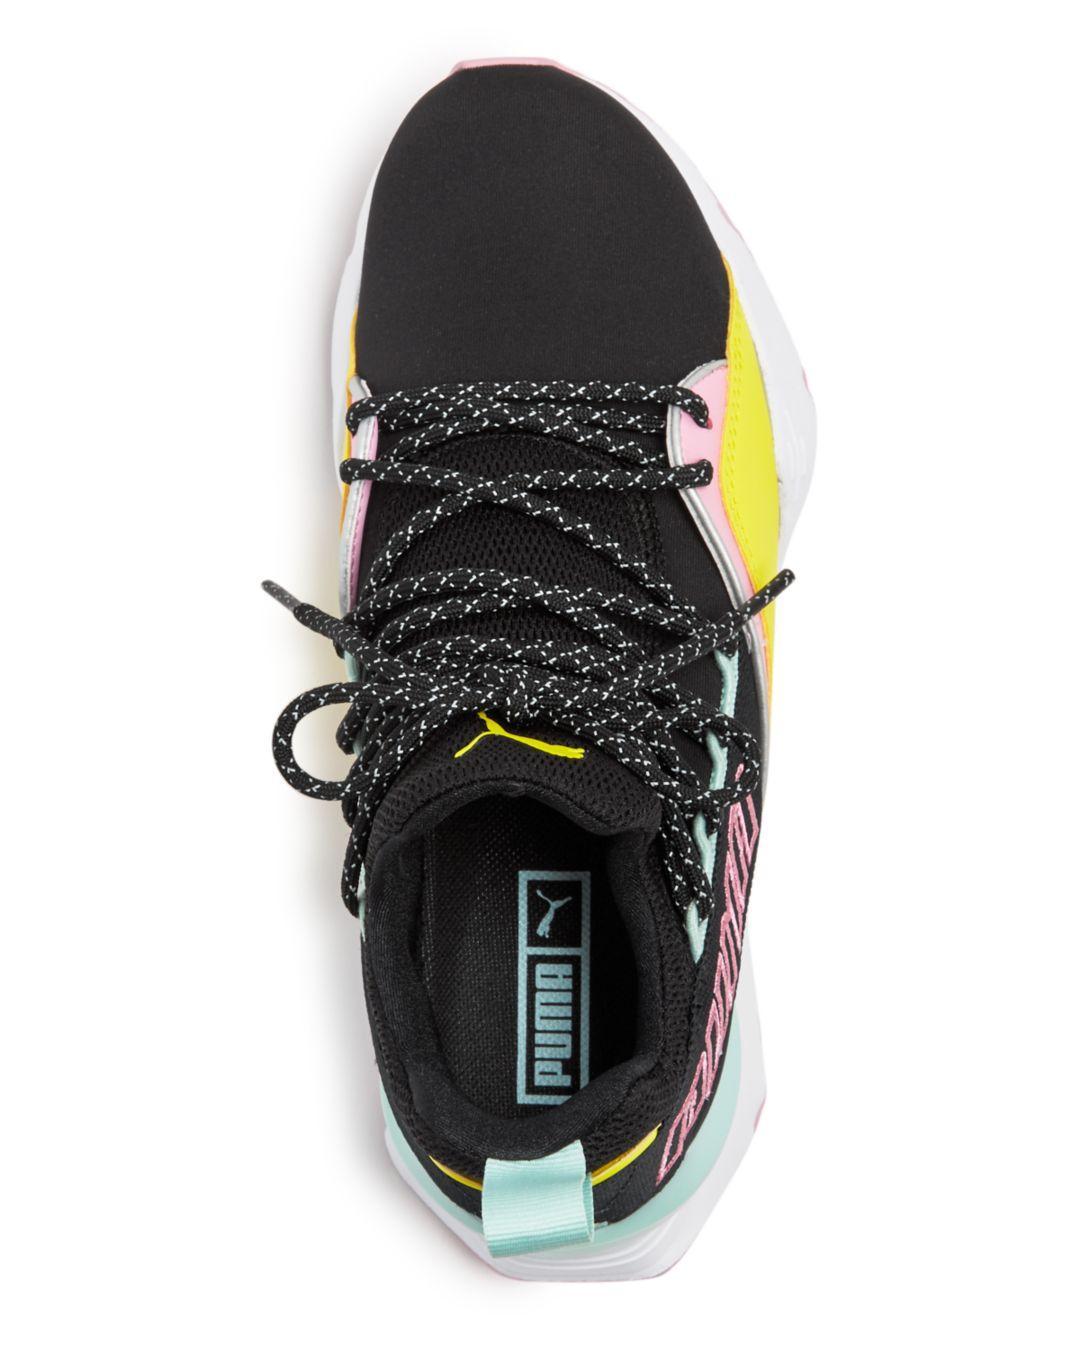 23a10c73b1de PUMA - Multicolor Women s Muse Maia Tz Knit Low-top Sneakers - Lyst. View  fullscreen